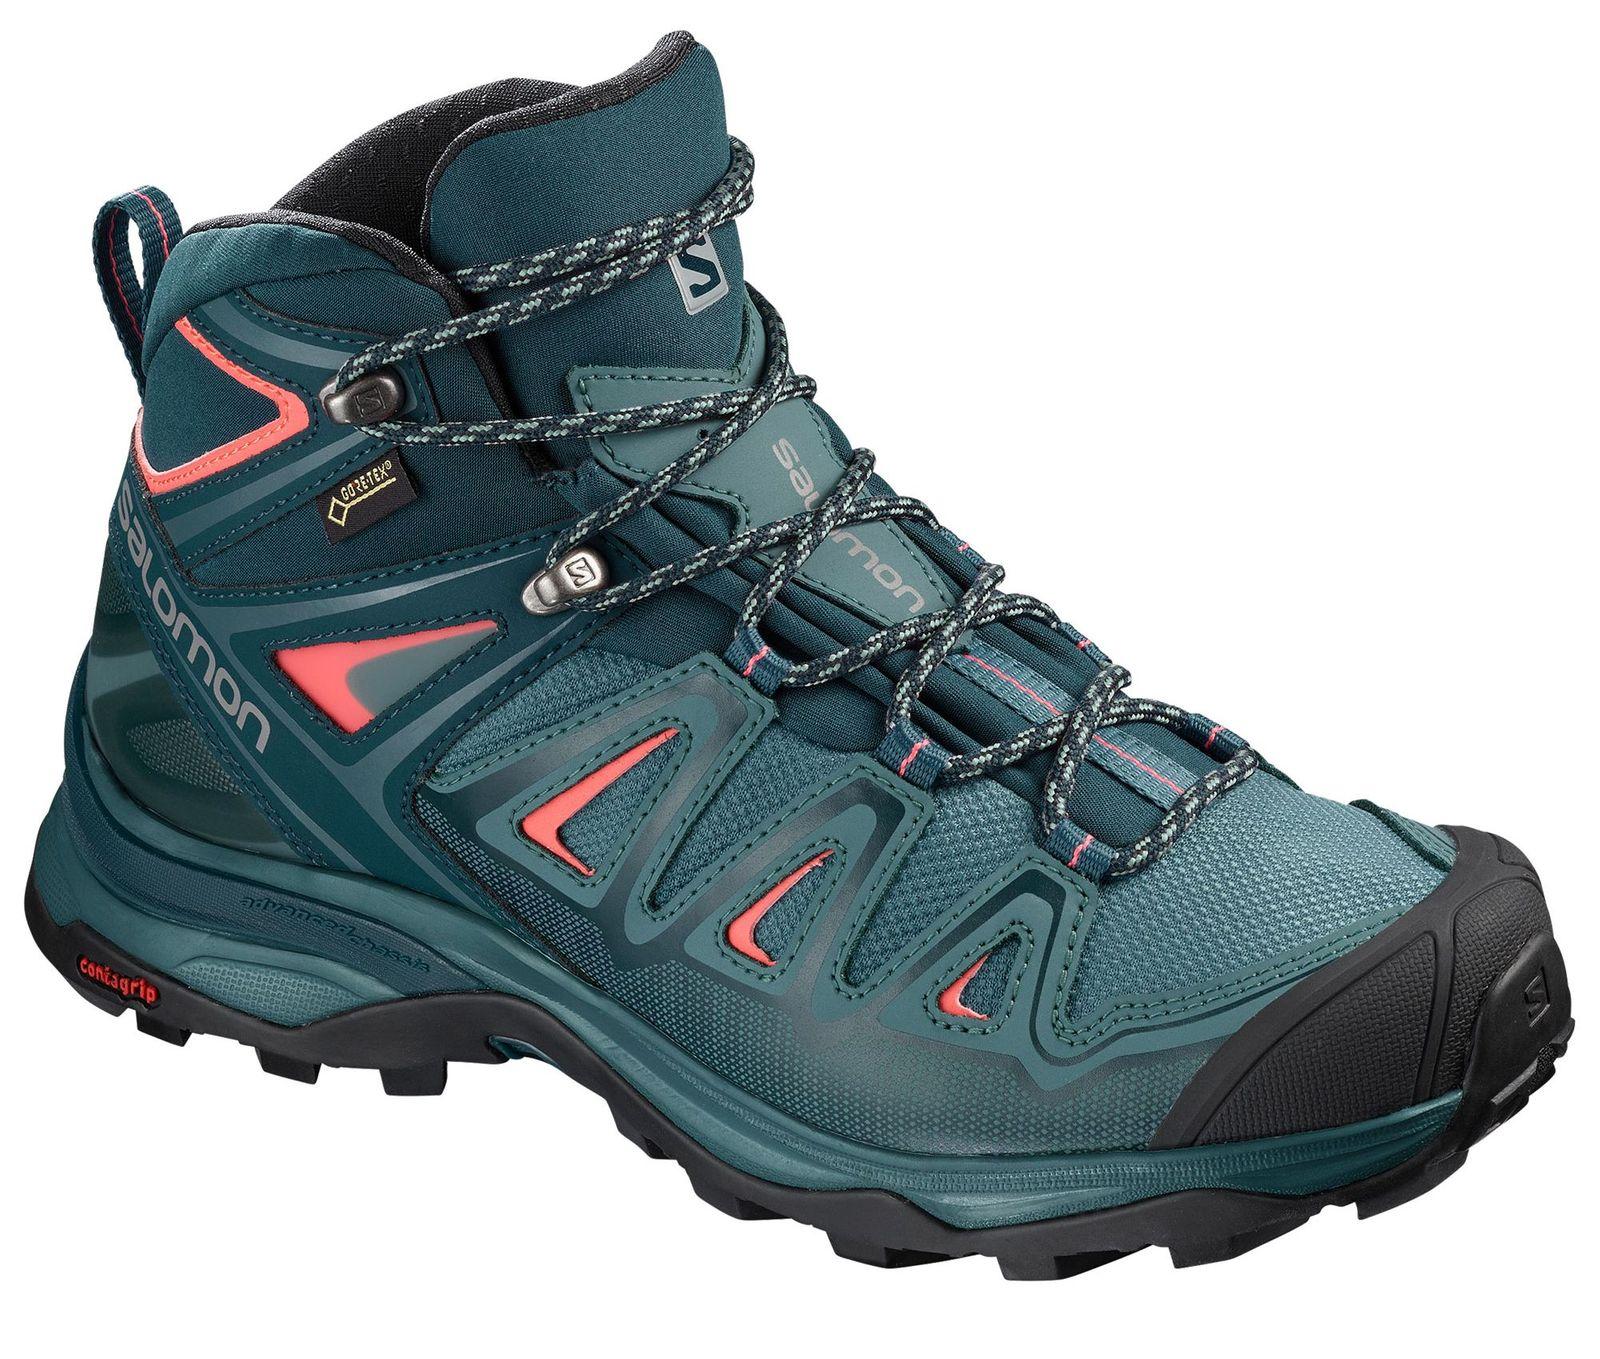 Rot X Ultra Trailschuhe Damen 3 Salomon Blau W Laufschuhe Gtx® Mid QxsrChdt